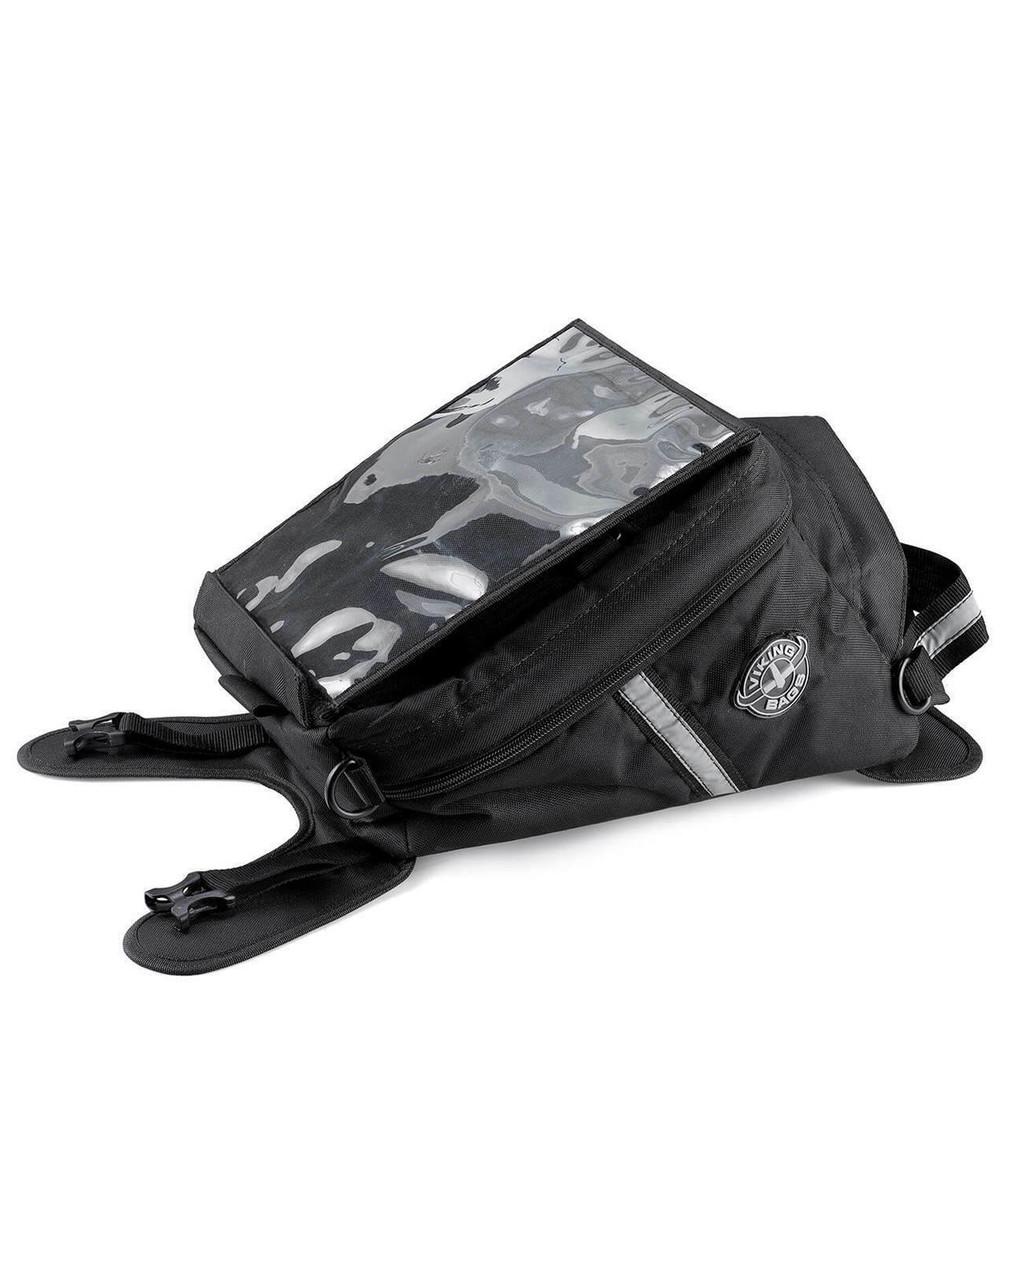 Viking Dirtman Medium Black Triumph Motorcycle Tank Bag Main Bag View